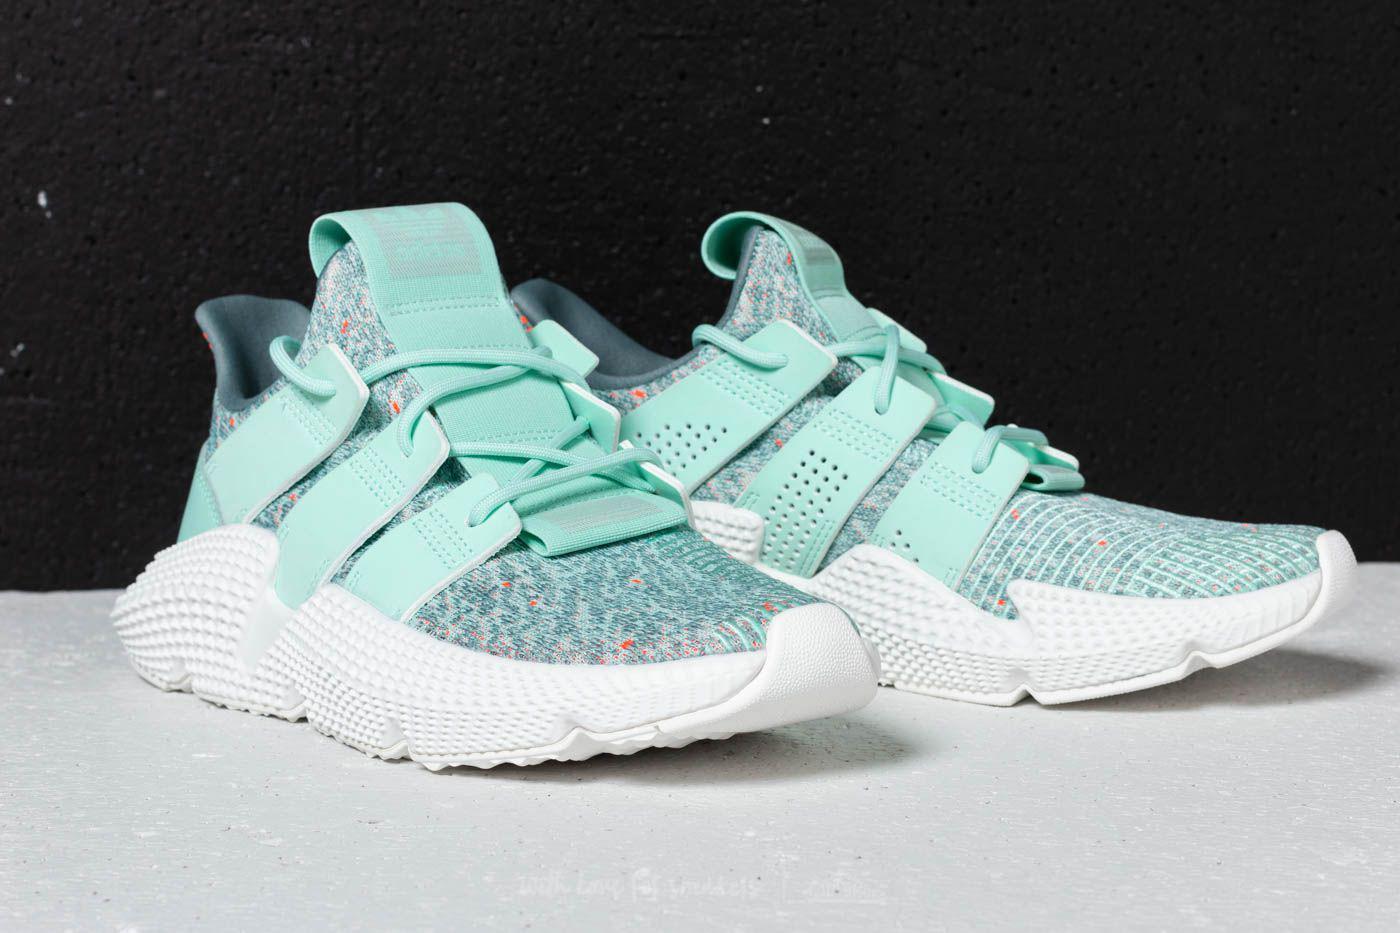 d48a02686cf128 Lyst - adidas Originals Adidas Prophere W Clear Mint  Clear Mint ...